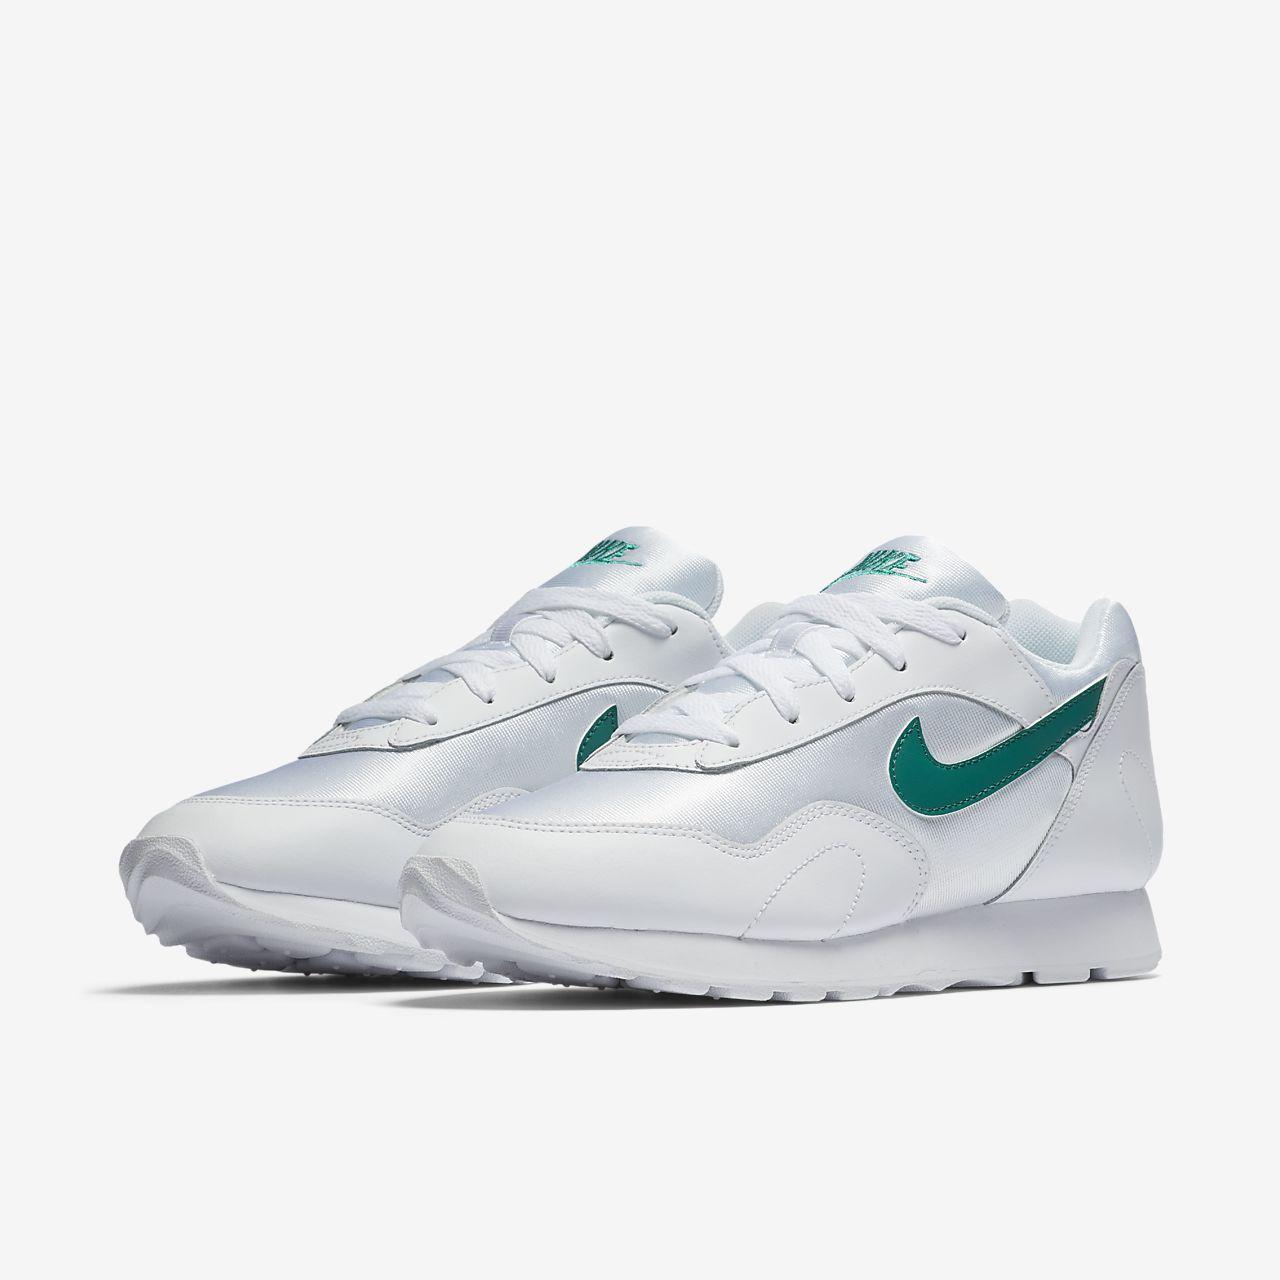 Nike Sportswear OUTBURST - Trainers - white/light retro/black 6khLR